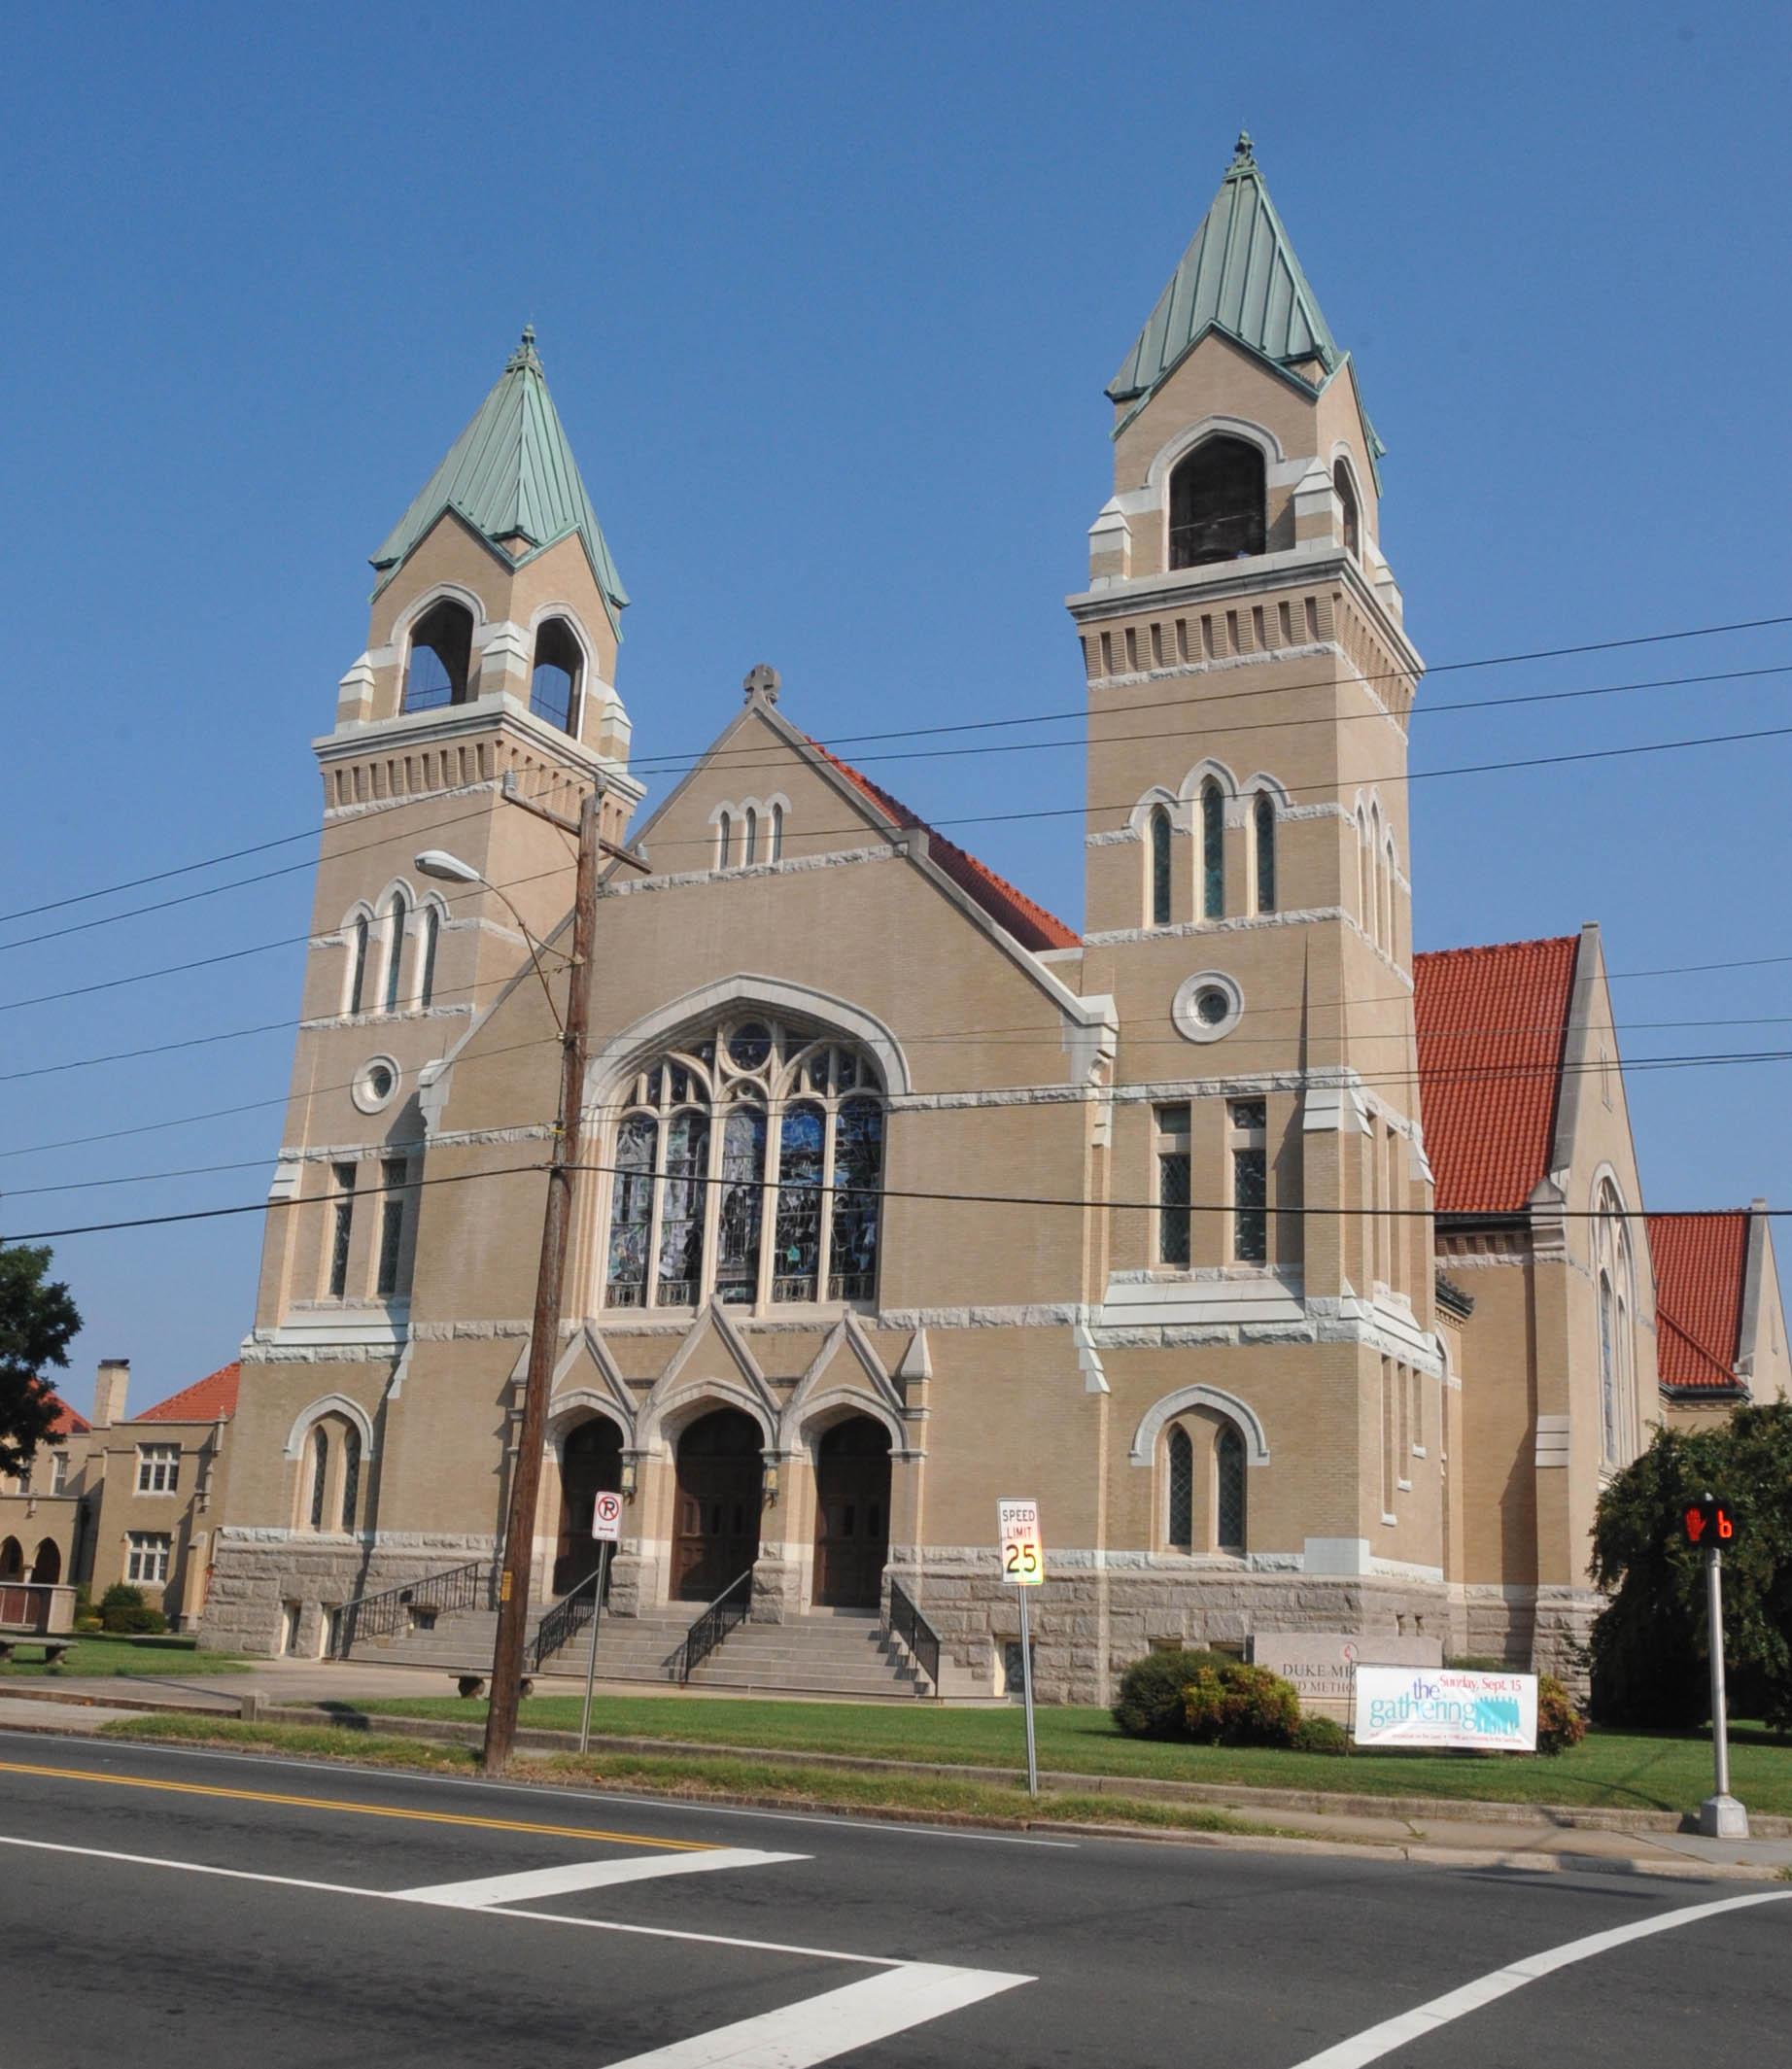 File:DUKE MEMORIAL UNITED METHODIST CHURCH, DURHAM COUNTY.jpgbalance of durham county